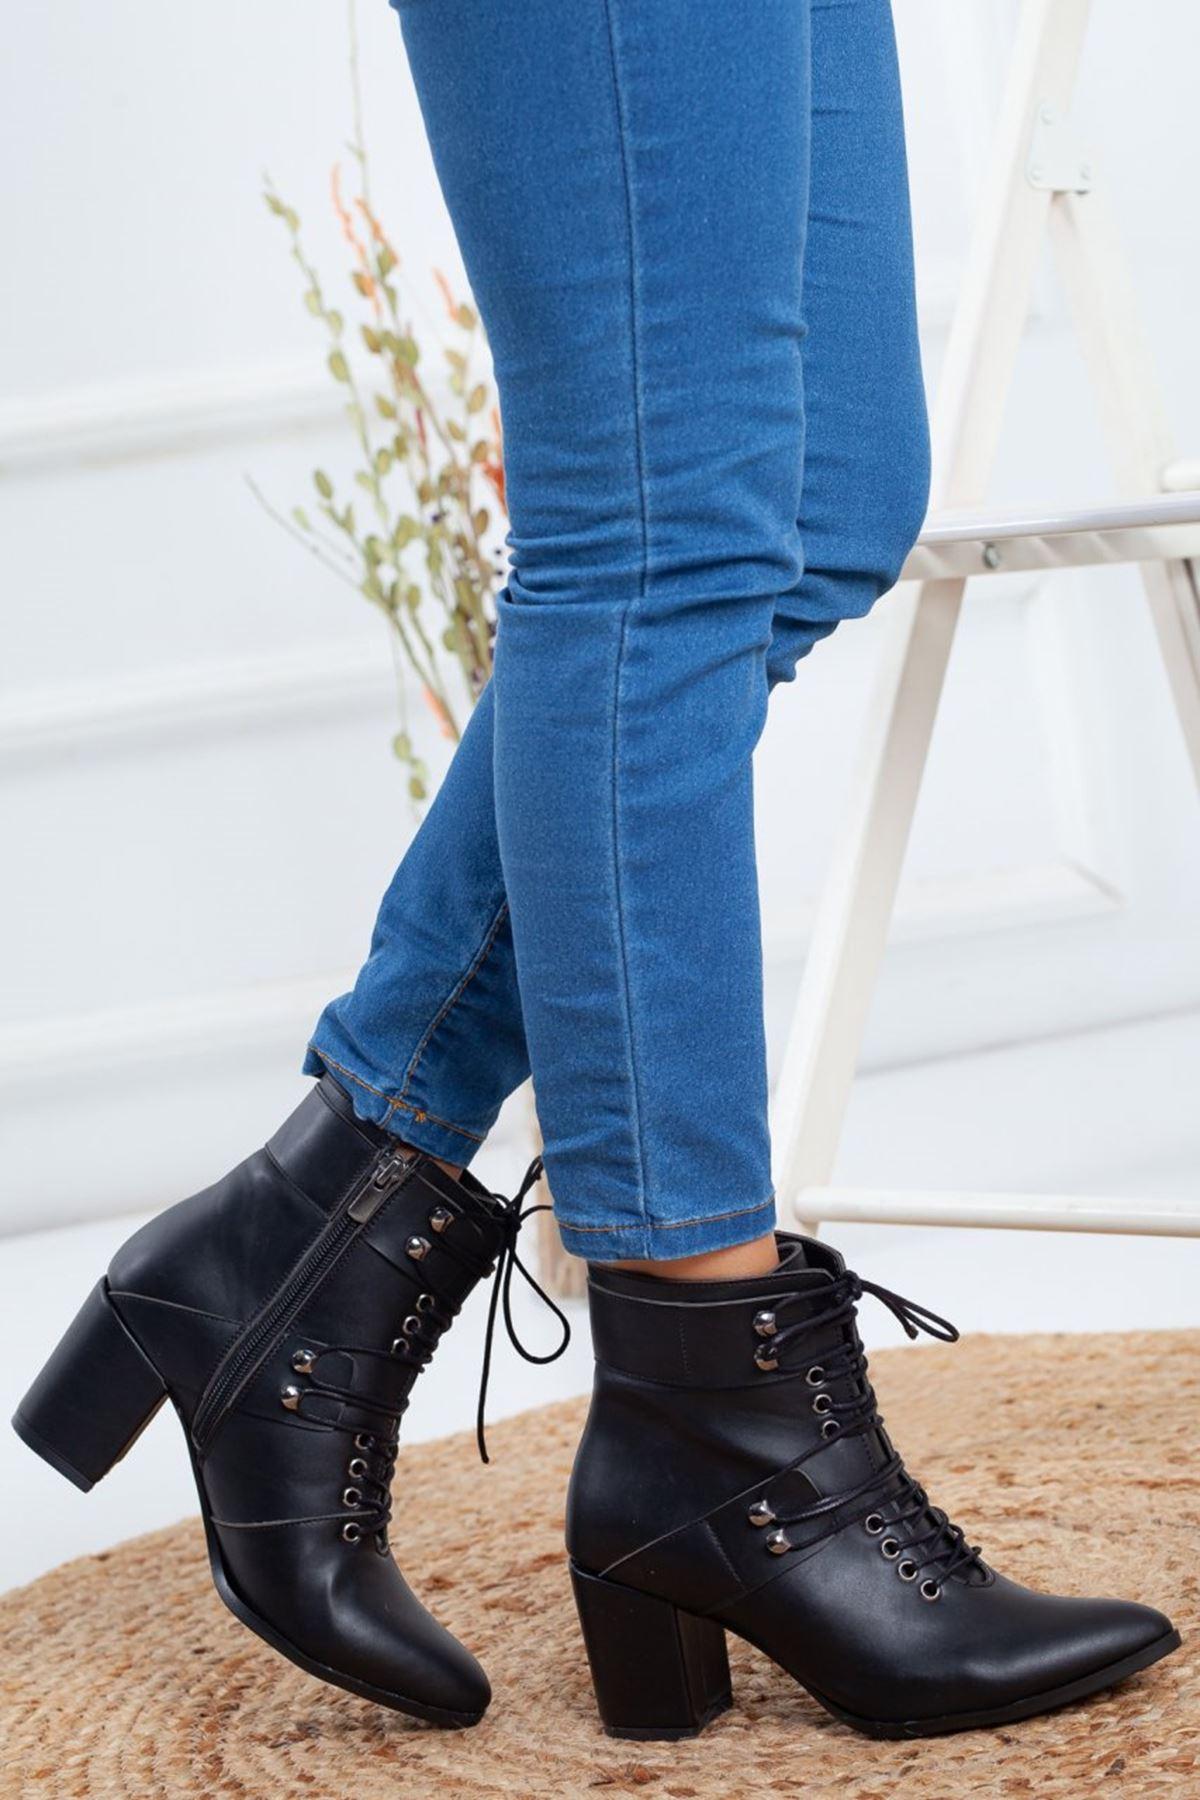 Kadın Mogli Topuklu Bağcıklı Mat Deri Siyah Bot